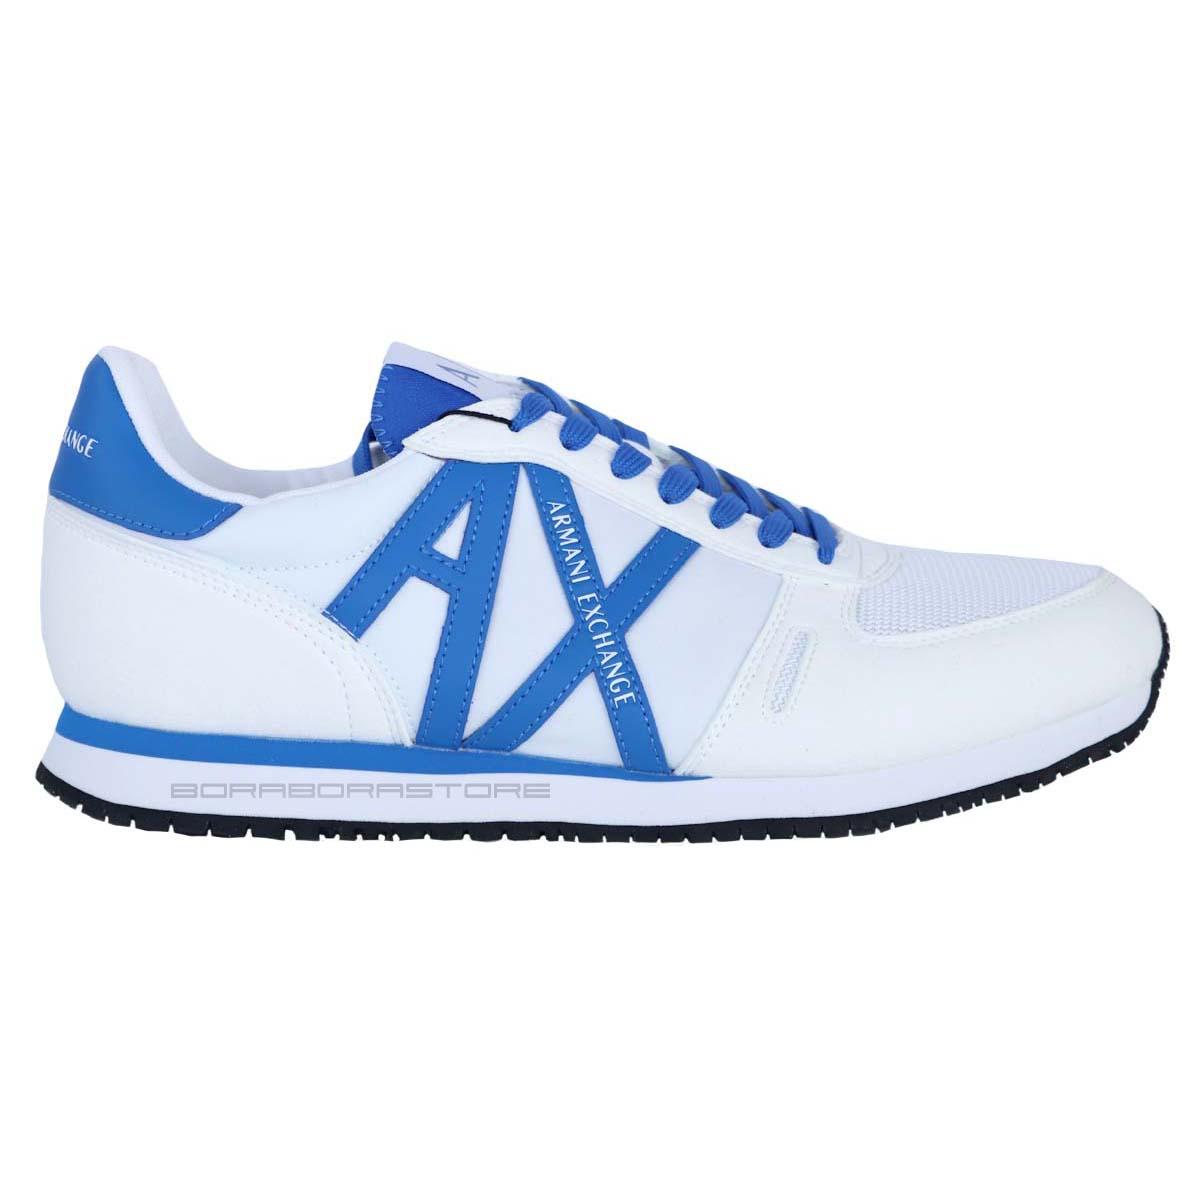 Scarpe uomo Armani Exchange sneakers XUX017 B139 bianco primavera ... 109f8933eb8